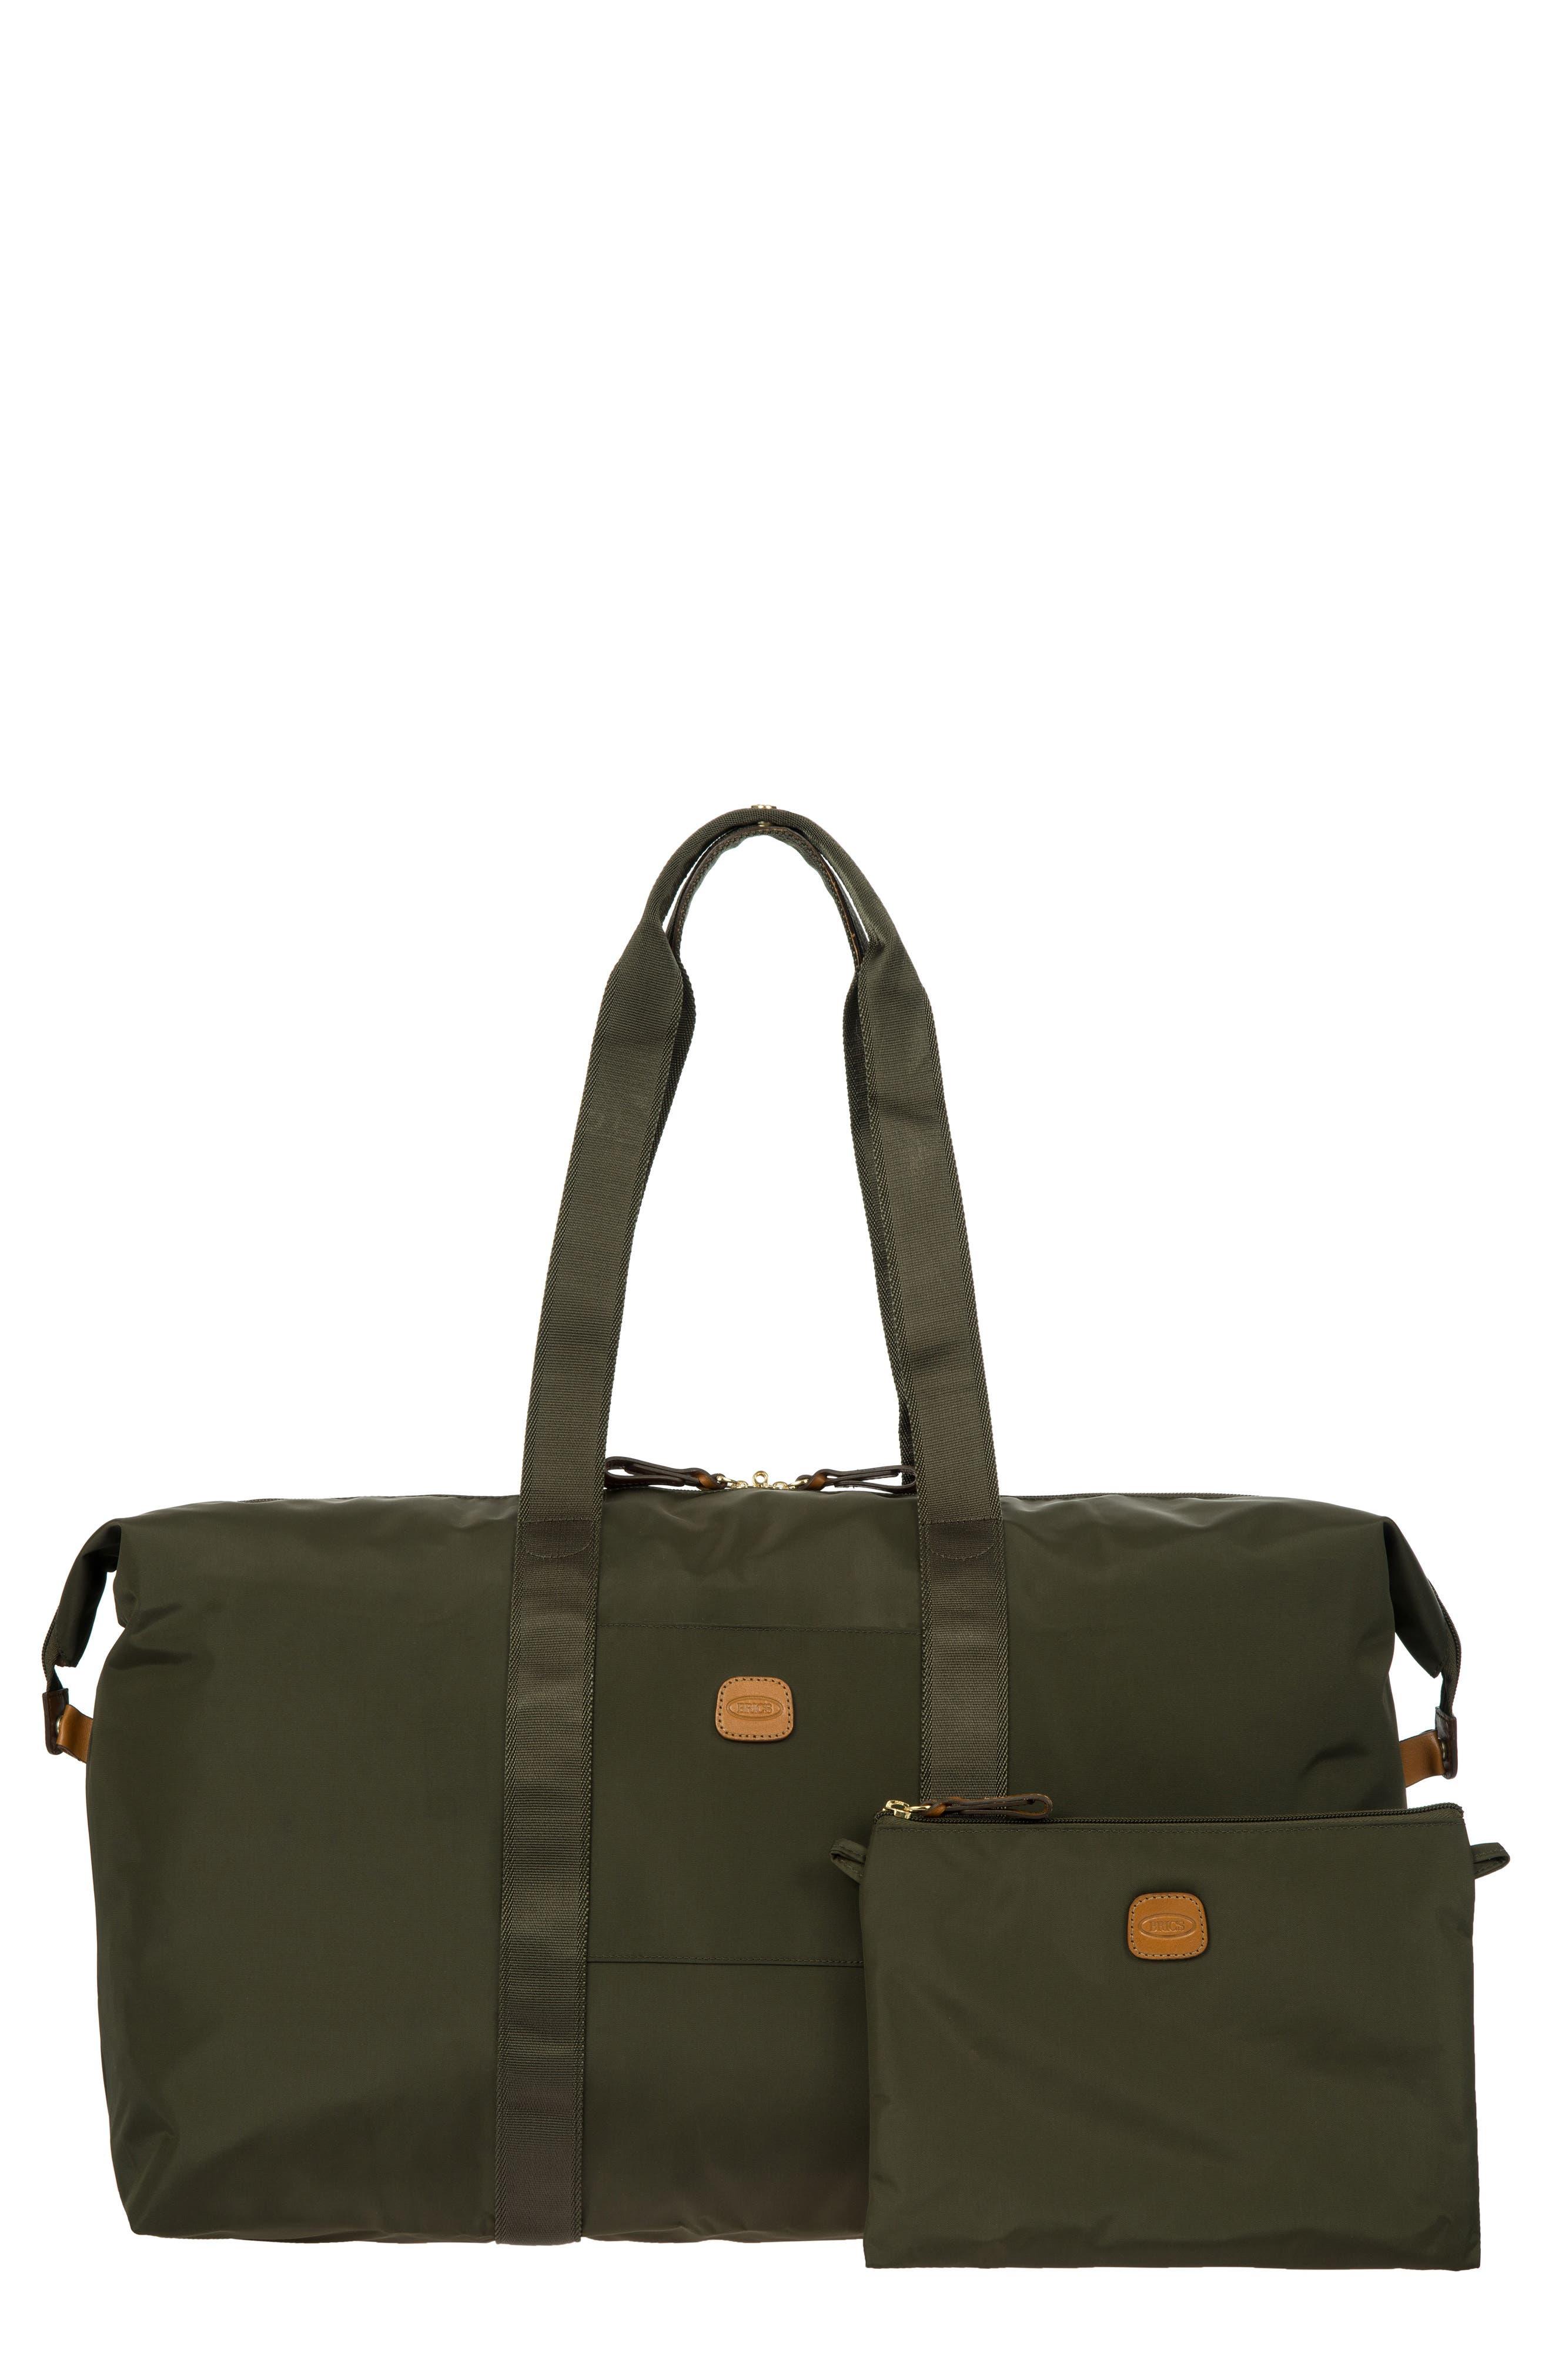 X-Bag 22-Inch Folding Duffel Bag,                             Main thumbnail 1, color,                             OLIVE